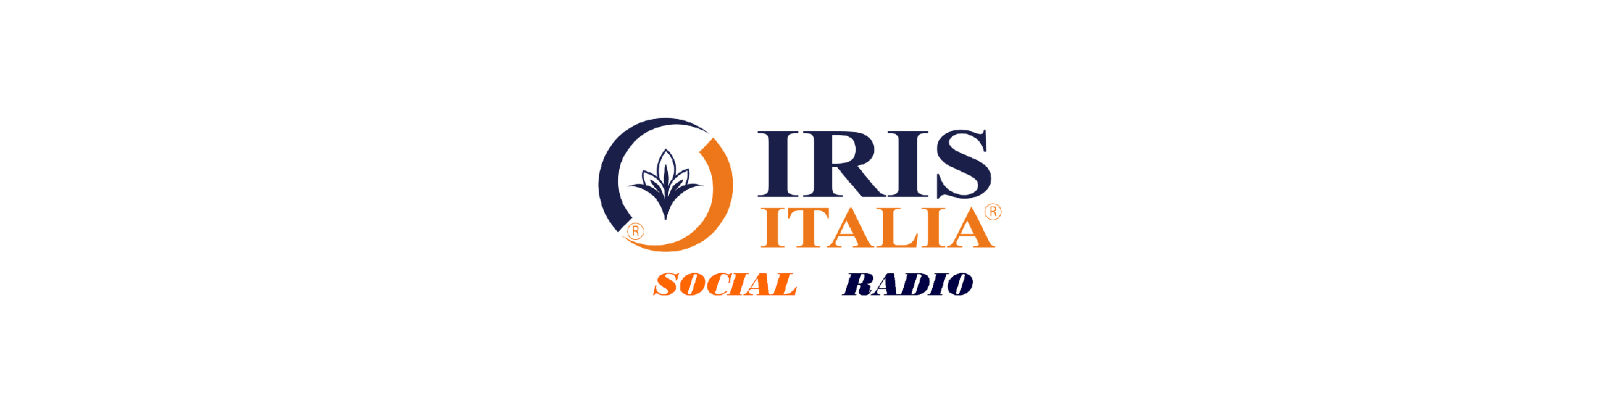 Iris Italia Social Radio